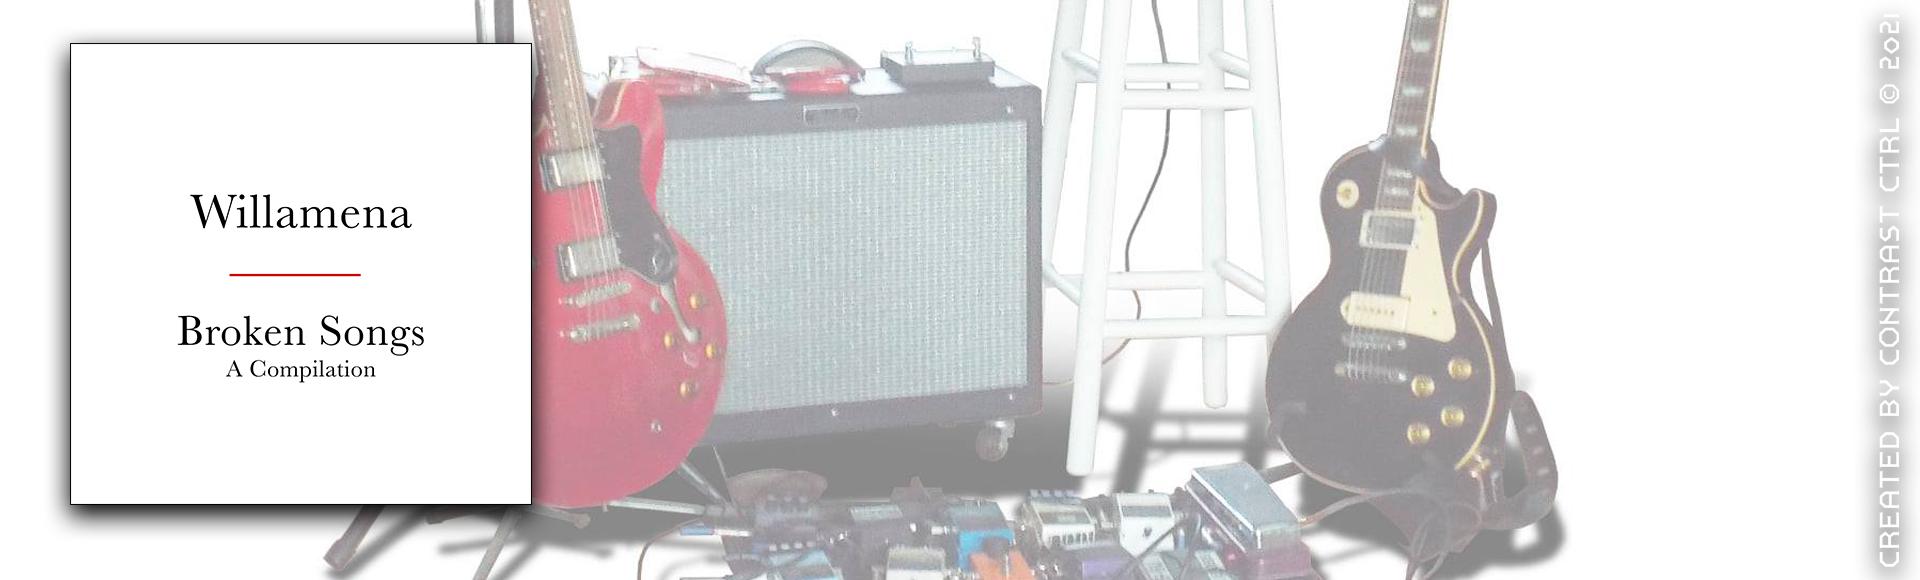 Review: Willamena – Broken Songs A Compilation